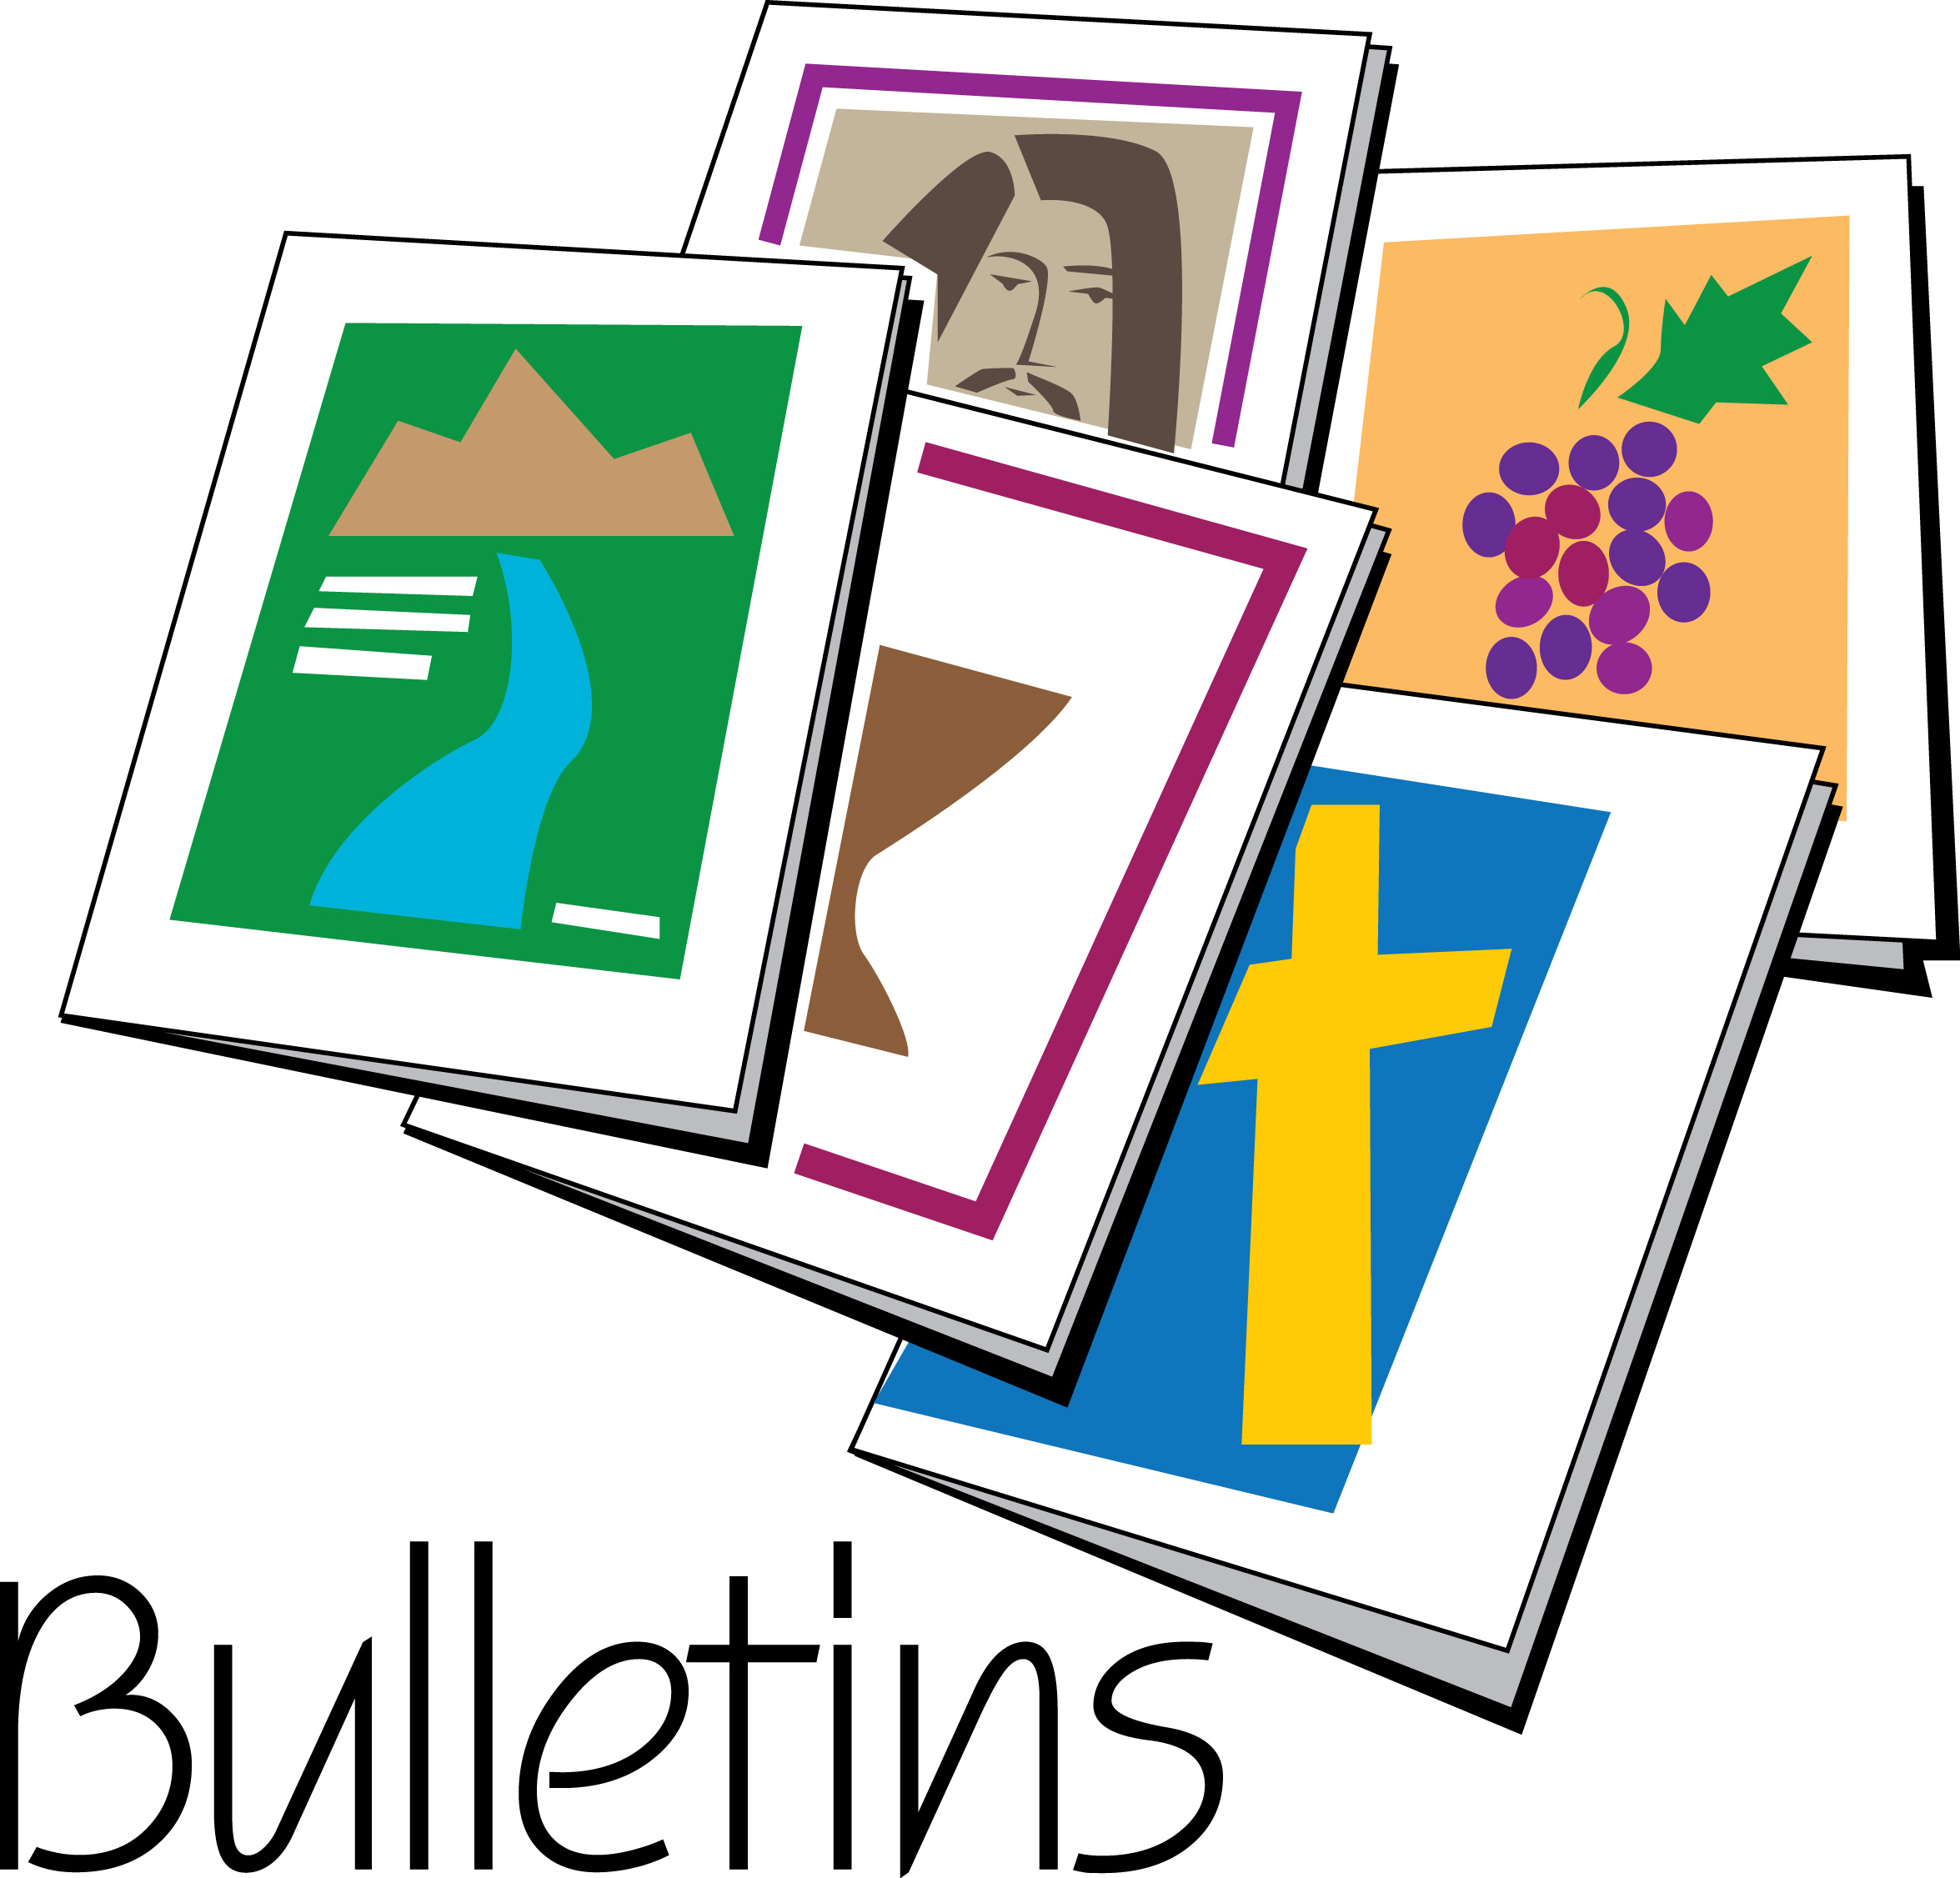 Church Bulletin Clip Art Clipart Best